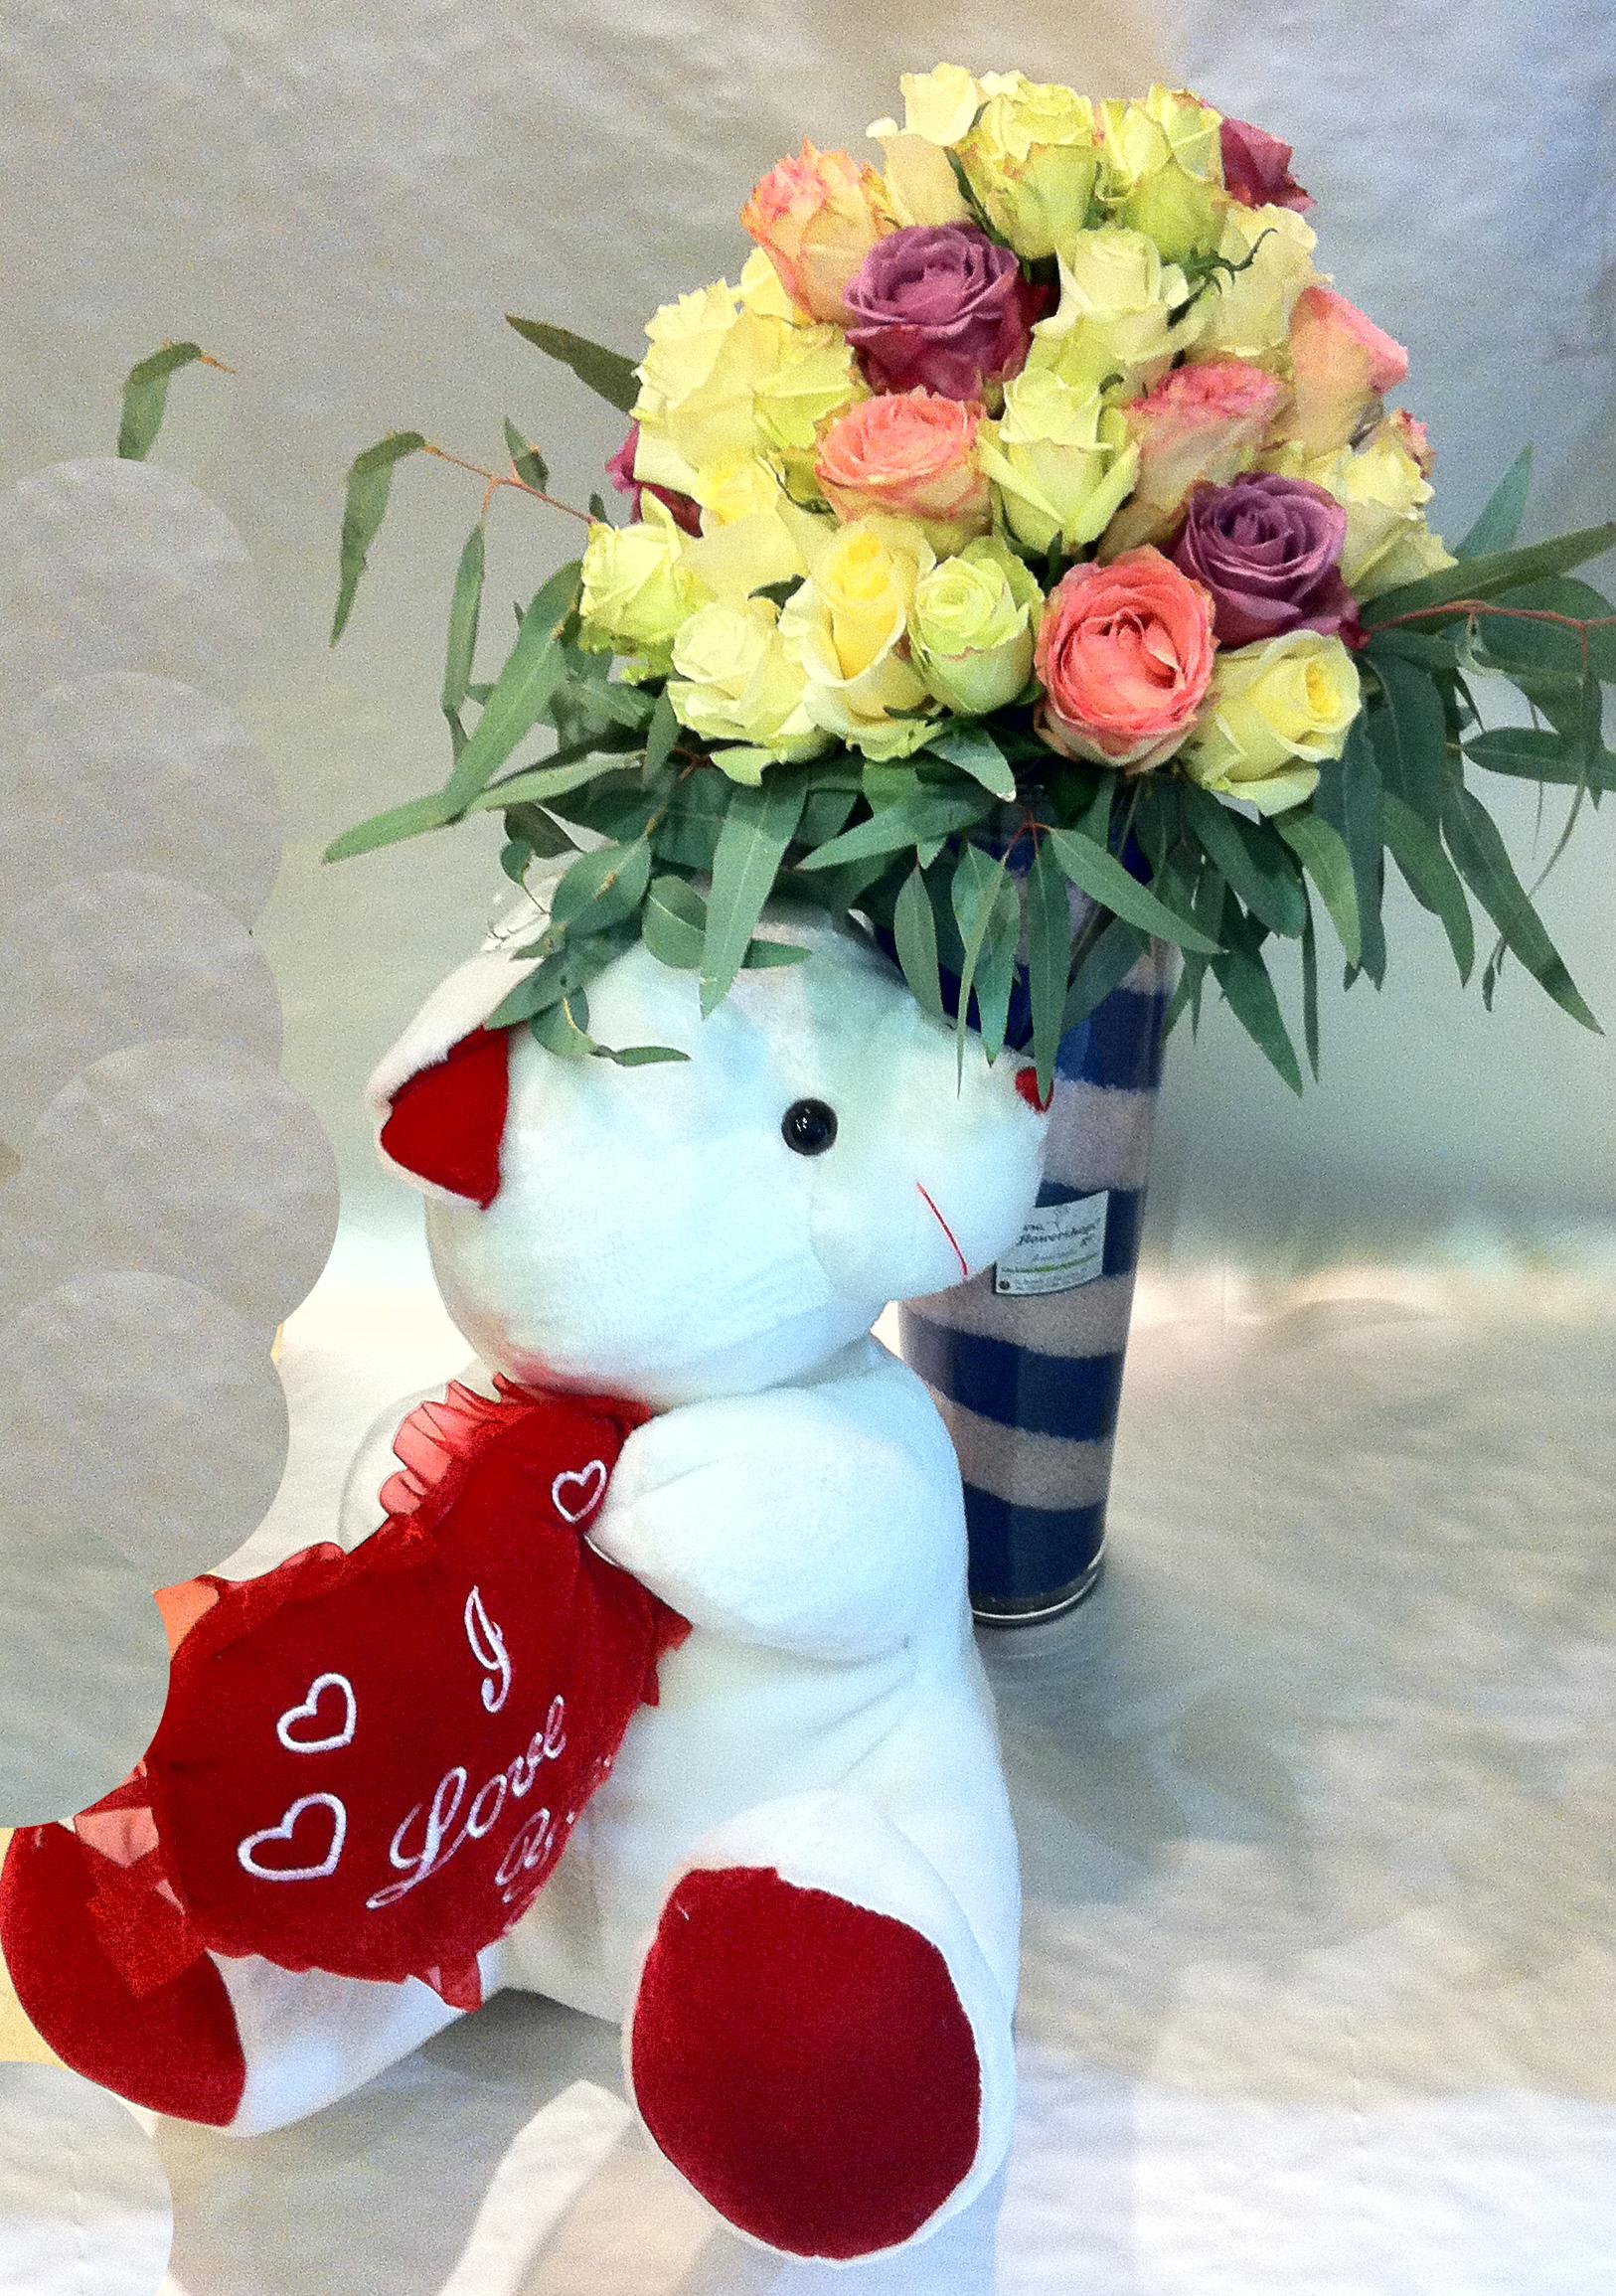 Roses arrangement  40 stems  Big Headed Ecuador  vase  colored sand decoration  Xlarge Teddy Bear